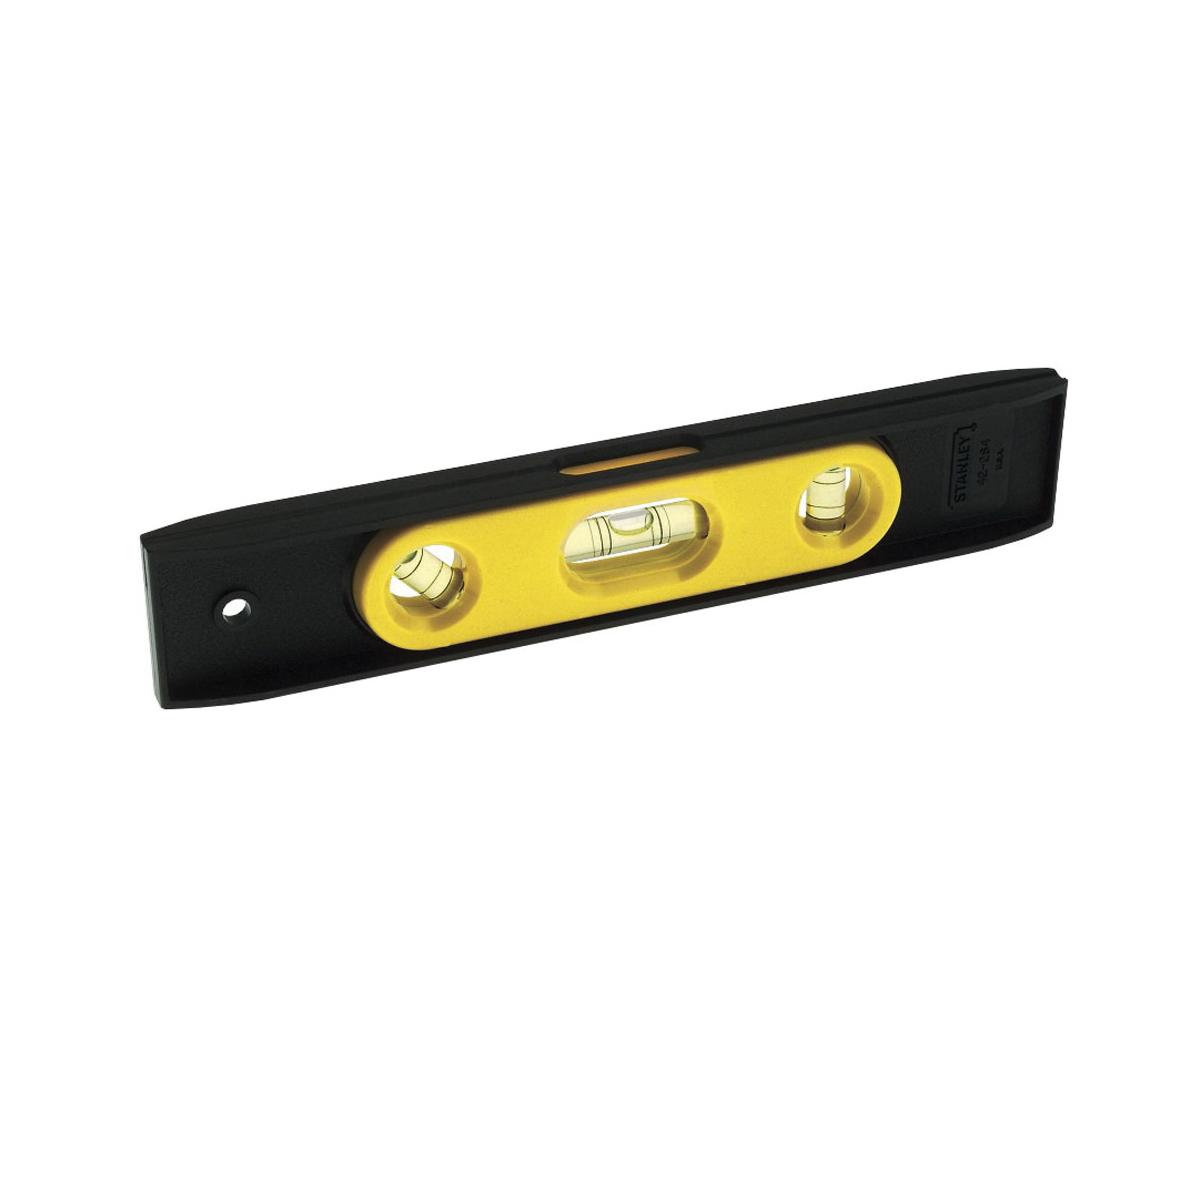 Stanley® 42-264 Magnetic Torpedo Level, 9 in L, 3 Vials, (1) Plumb, (1) Top Read Level, (1) 45 deg Vial Position, 0.005 in, ABS